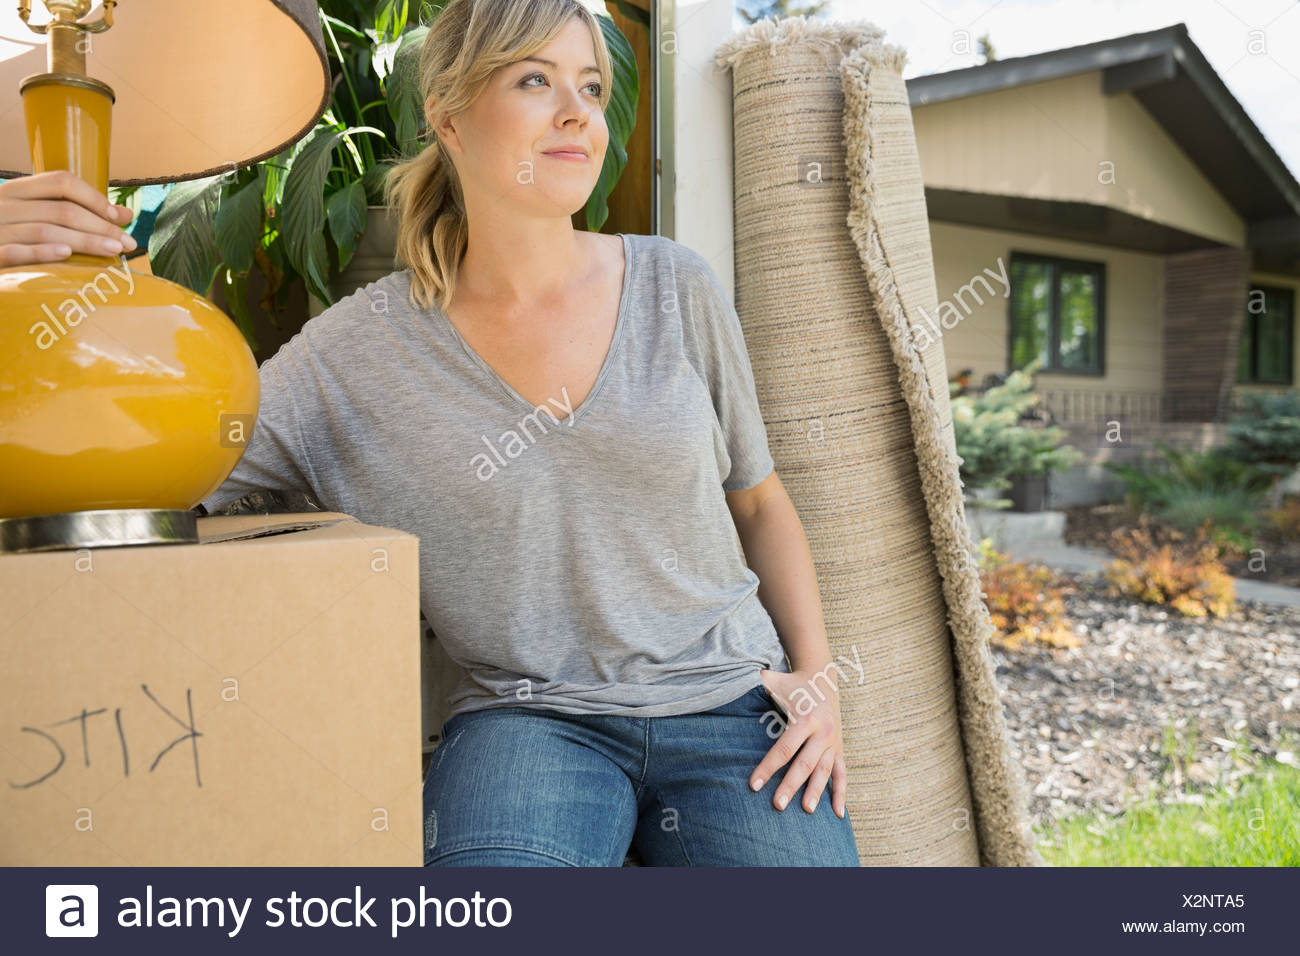 Woman unloading belongings from moving van Stock Photo